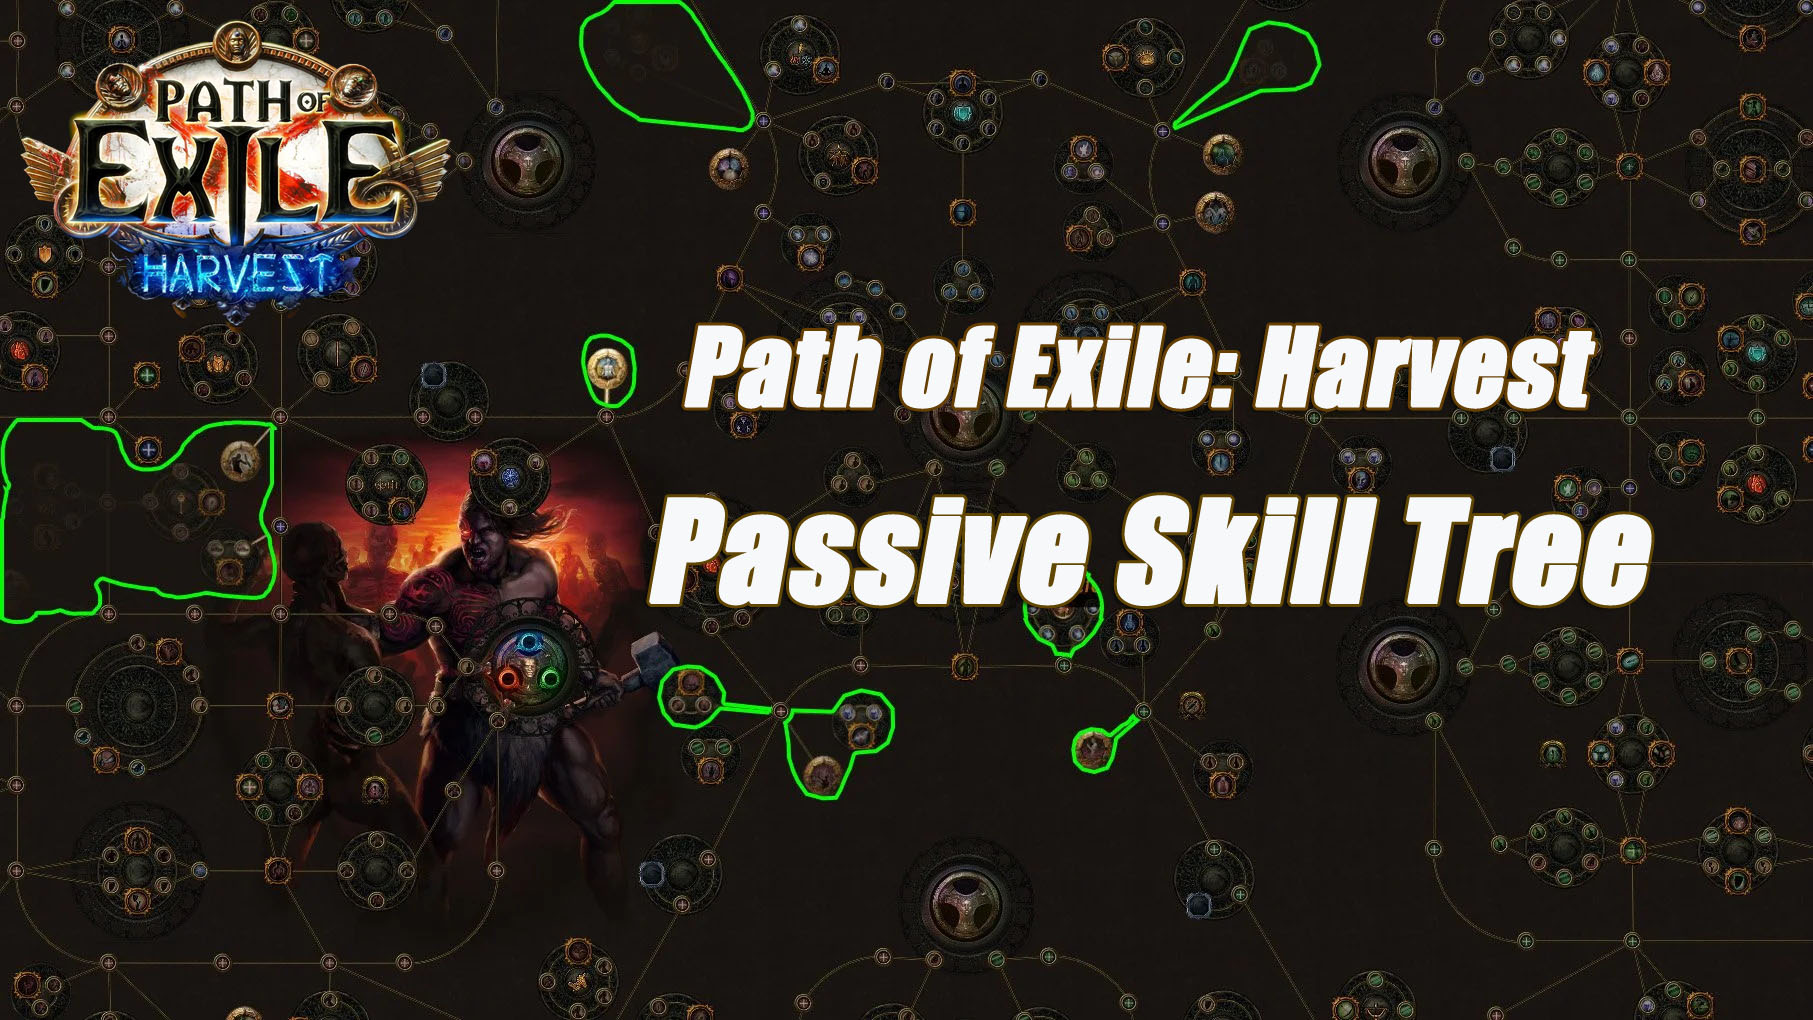 Passive Skill Tree